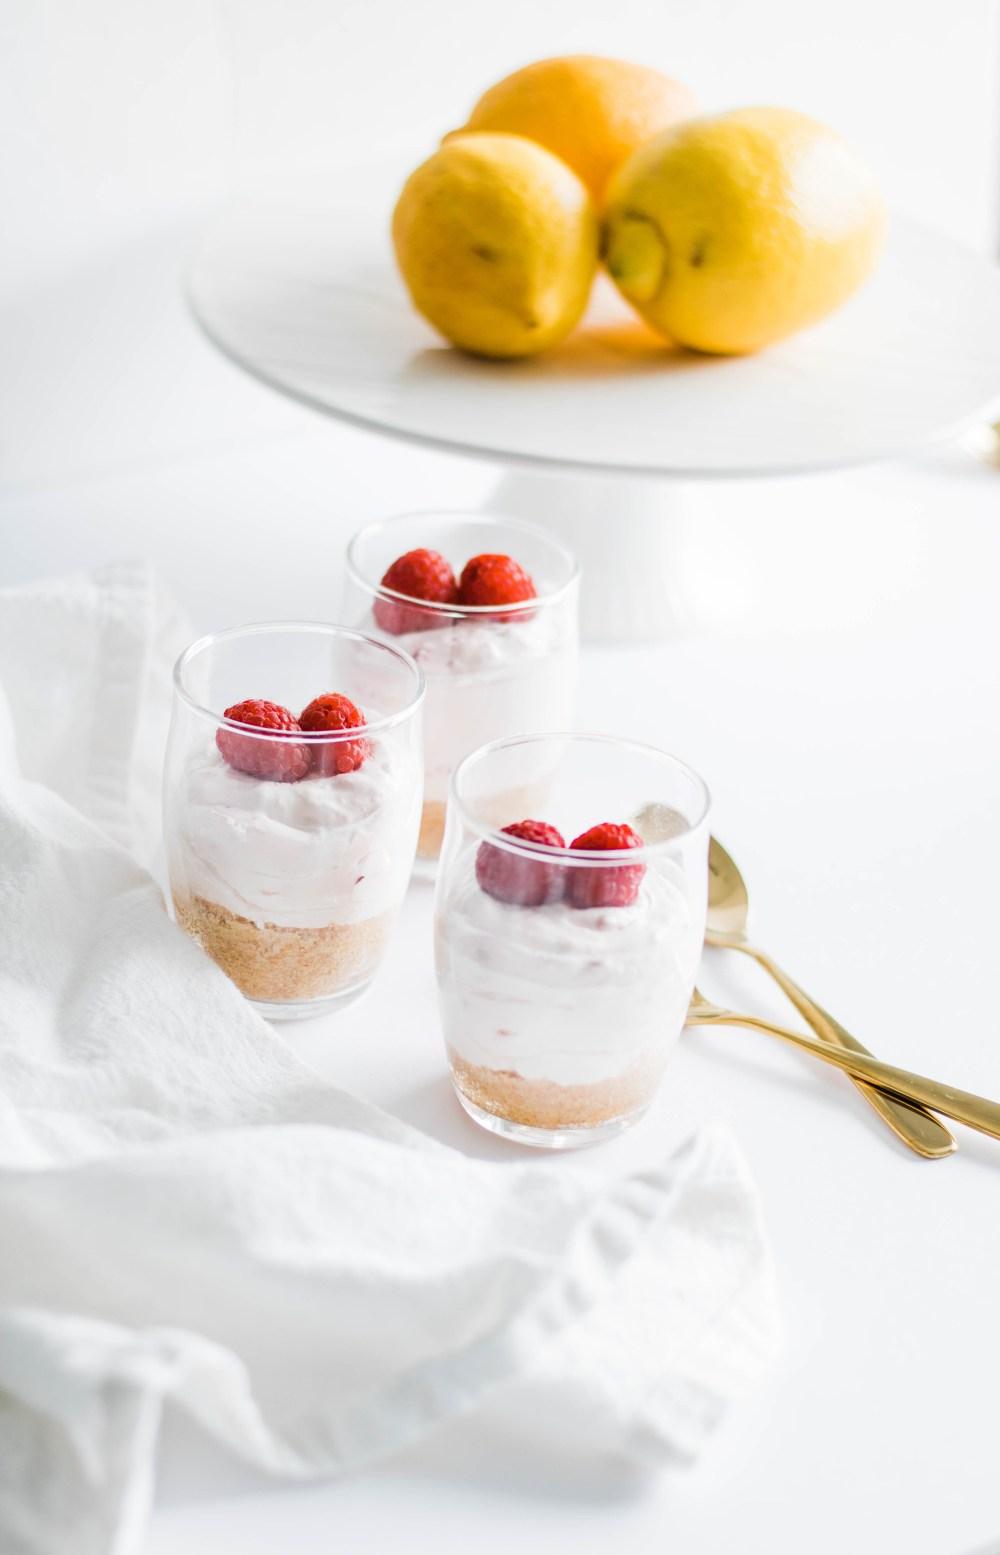 No-Bake Raspberry Lemon Cheesecake Cups #dessert #cheesecake #lemon #foodphotography #nobake